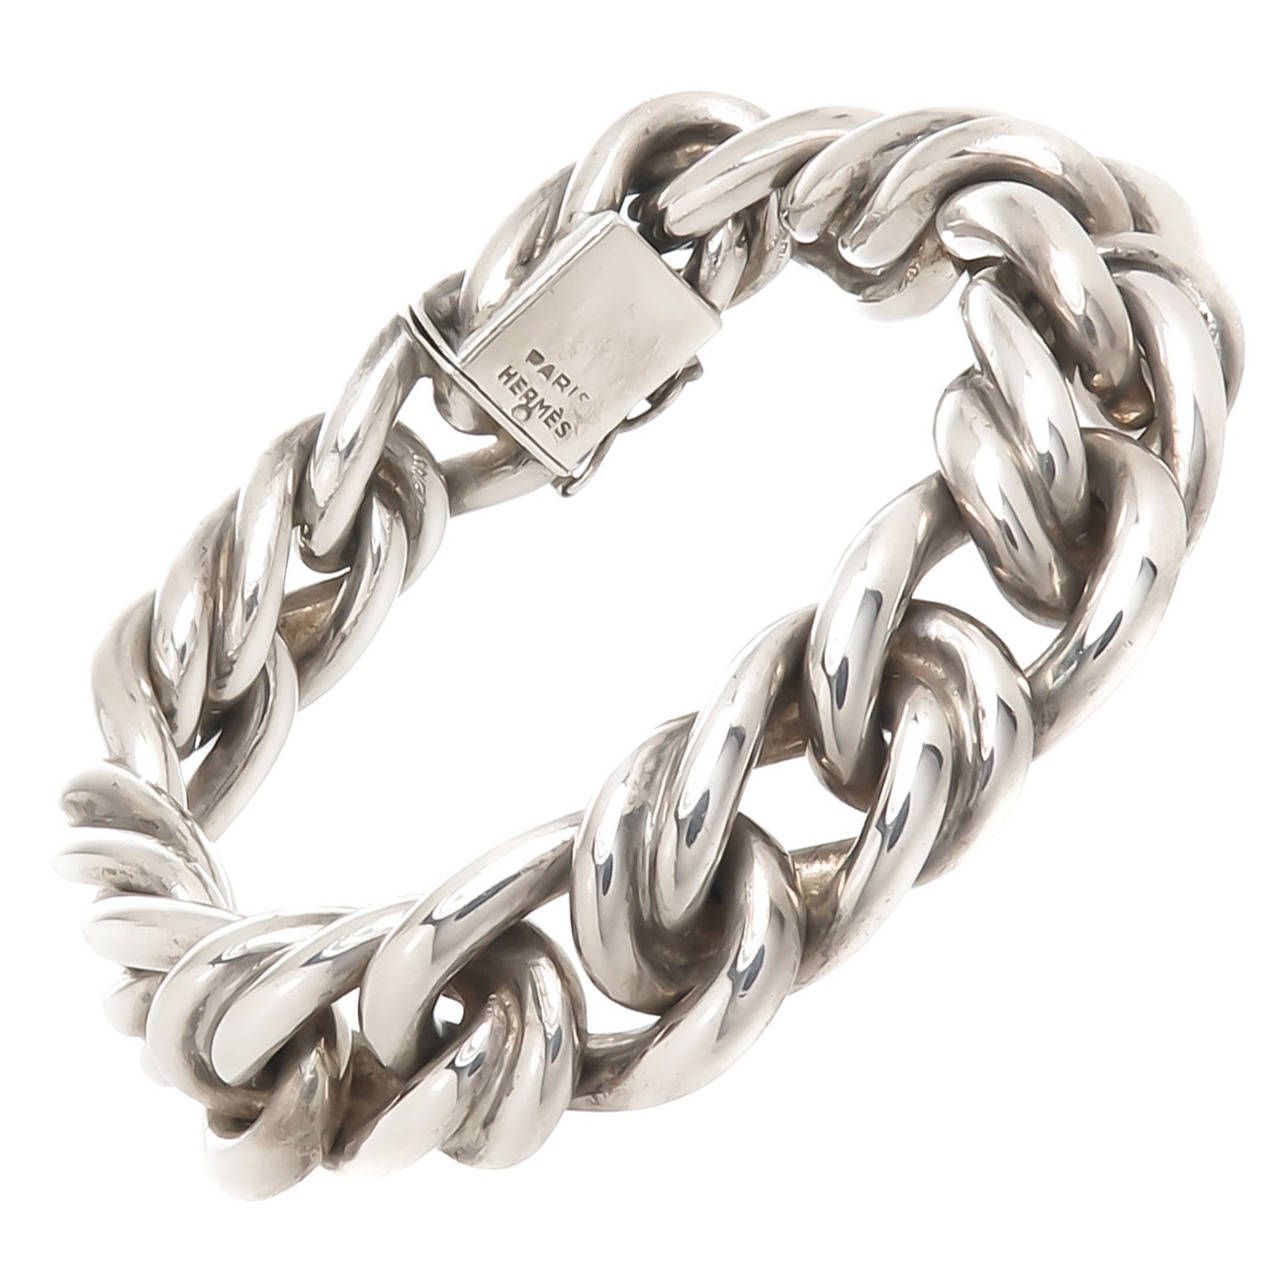 hermes paris solid heavy silver link bracelet schmuckst ck und schmuck. Black Bedroom Furniture Sets. Home Design Ideas